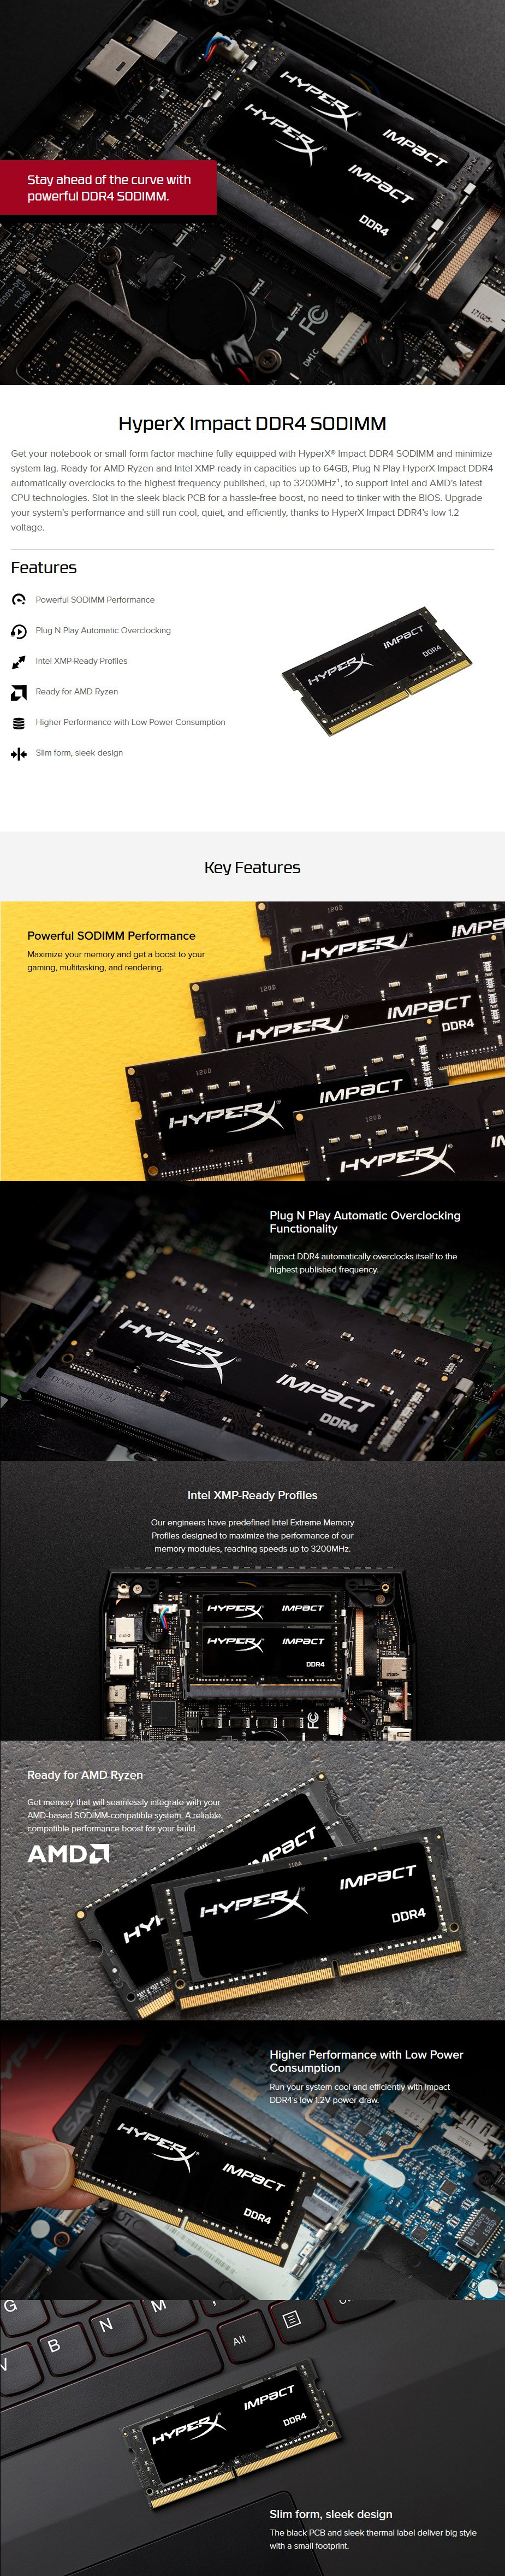 kingston-hyperx-impact-16gb-2x-8gb-ddr4-2666mhz-notebook-memory-ac38662-4-2-.jpg